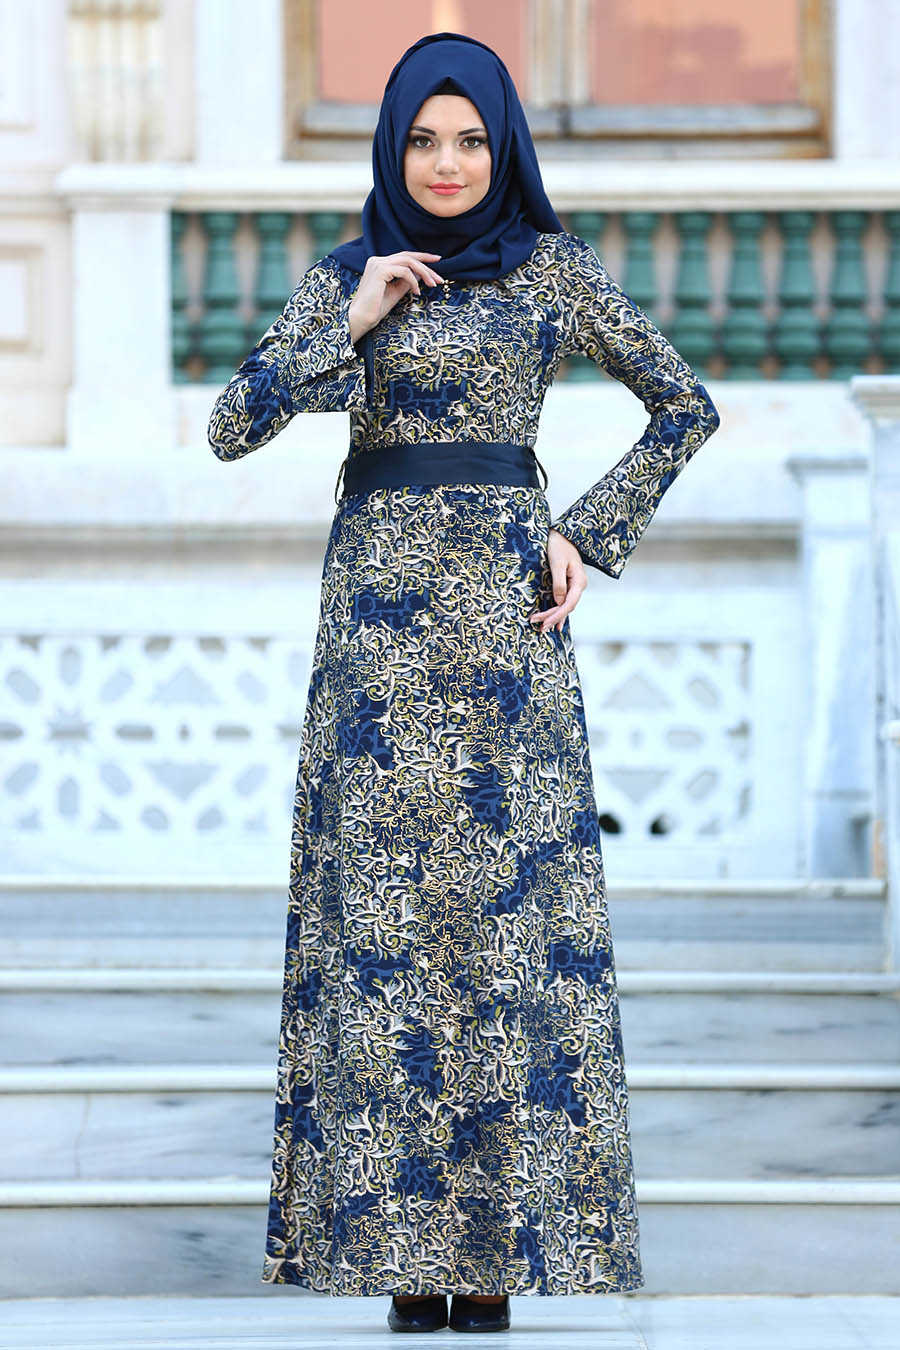 580a918542afc تحميـــل · Hijab Dress ازياء محجبات صور ...